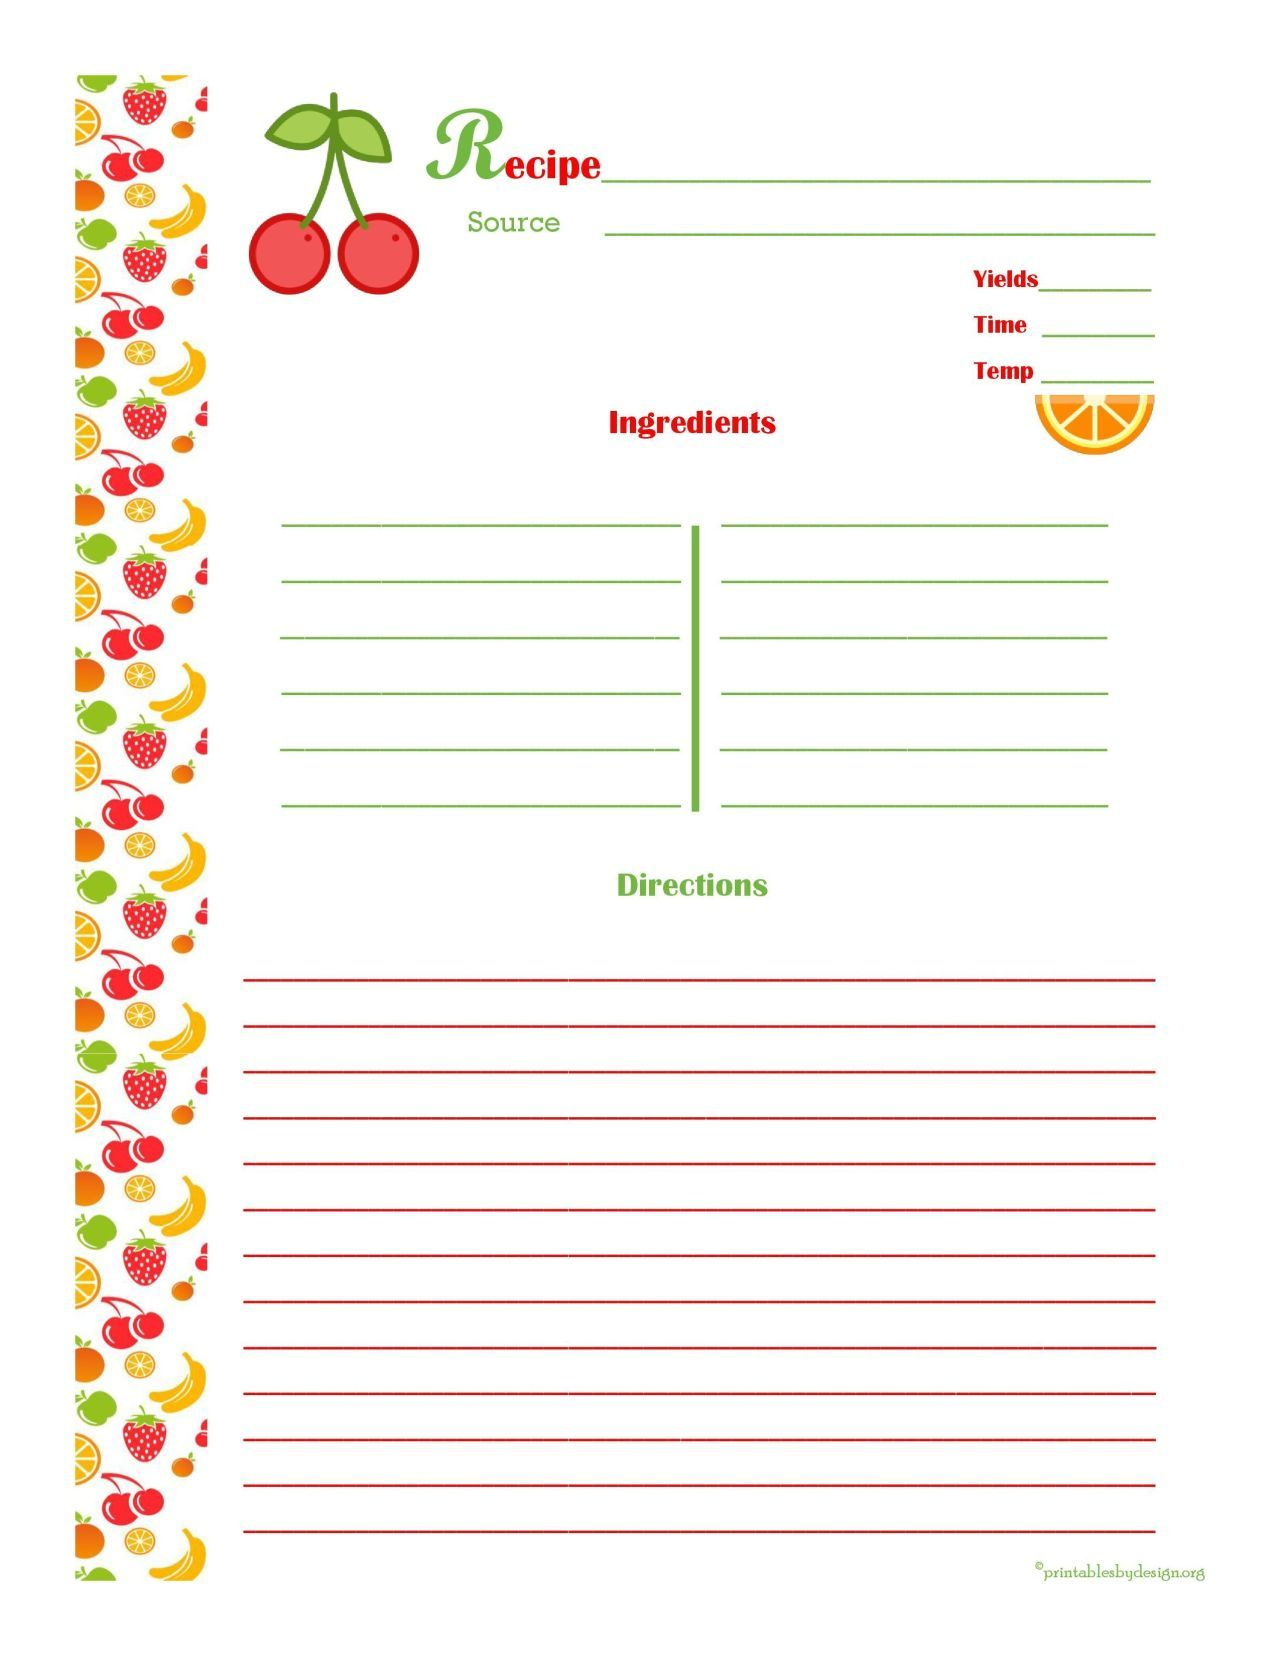 Free Editable Recipe Card Templates For Microsoft Word With Regard To Free Recipe Card Templates For Microsoft Word